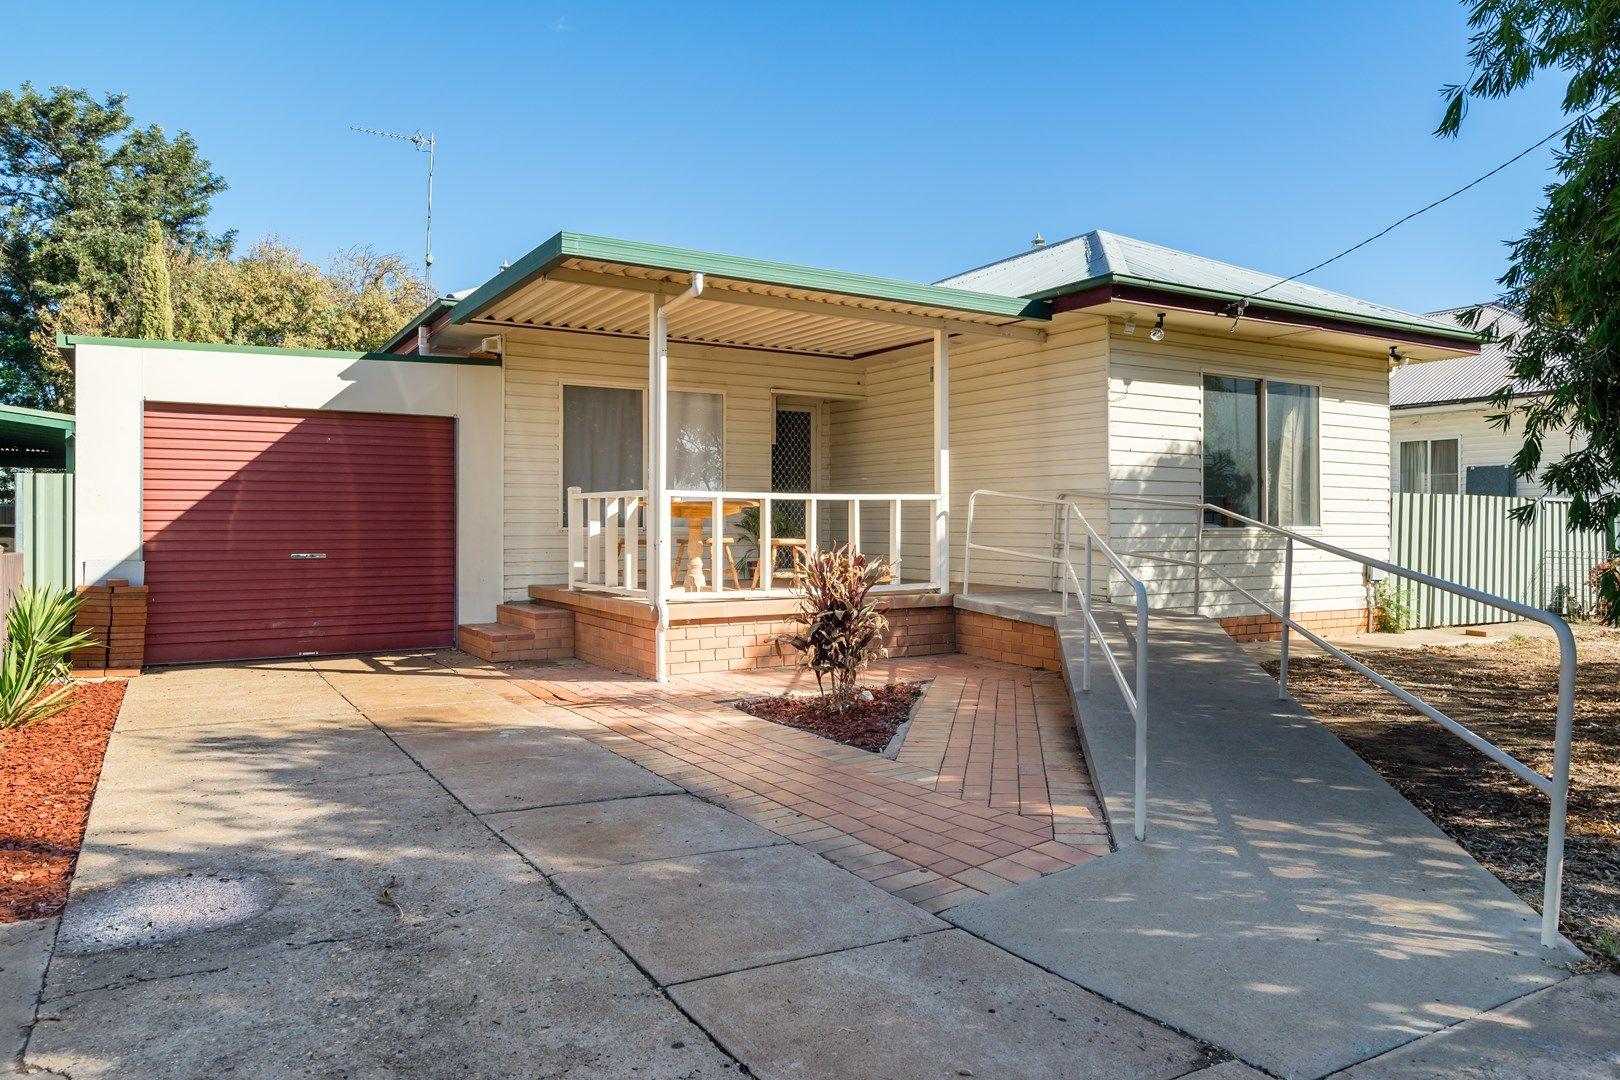 93 Macleay Street, Dubbo NSW 2830, Image 0